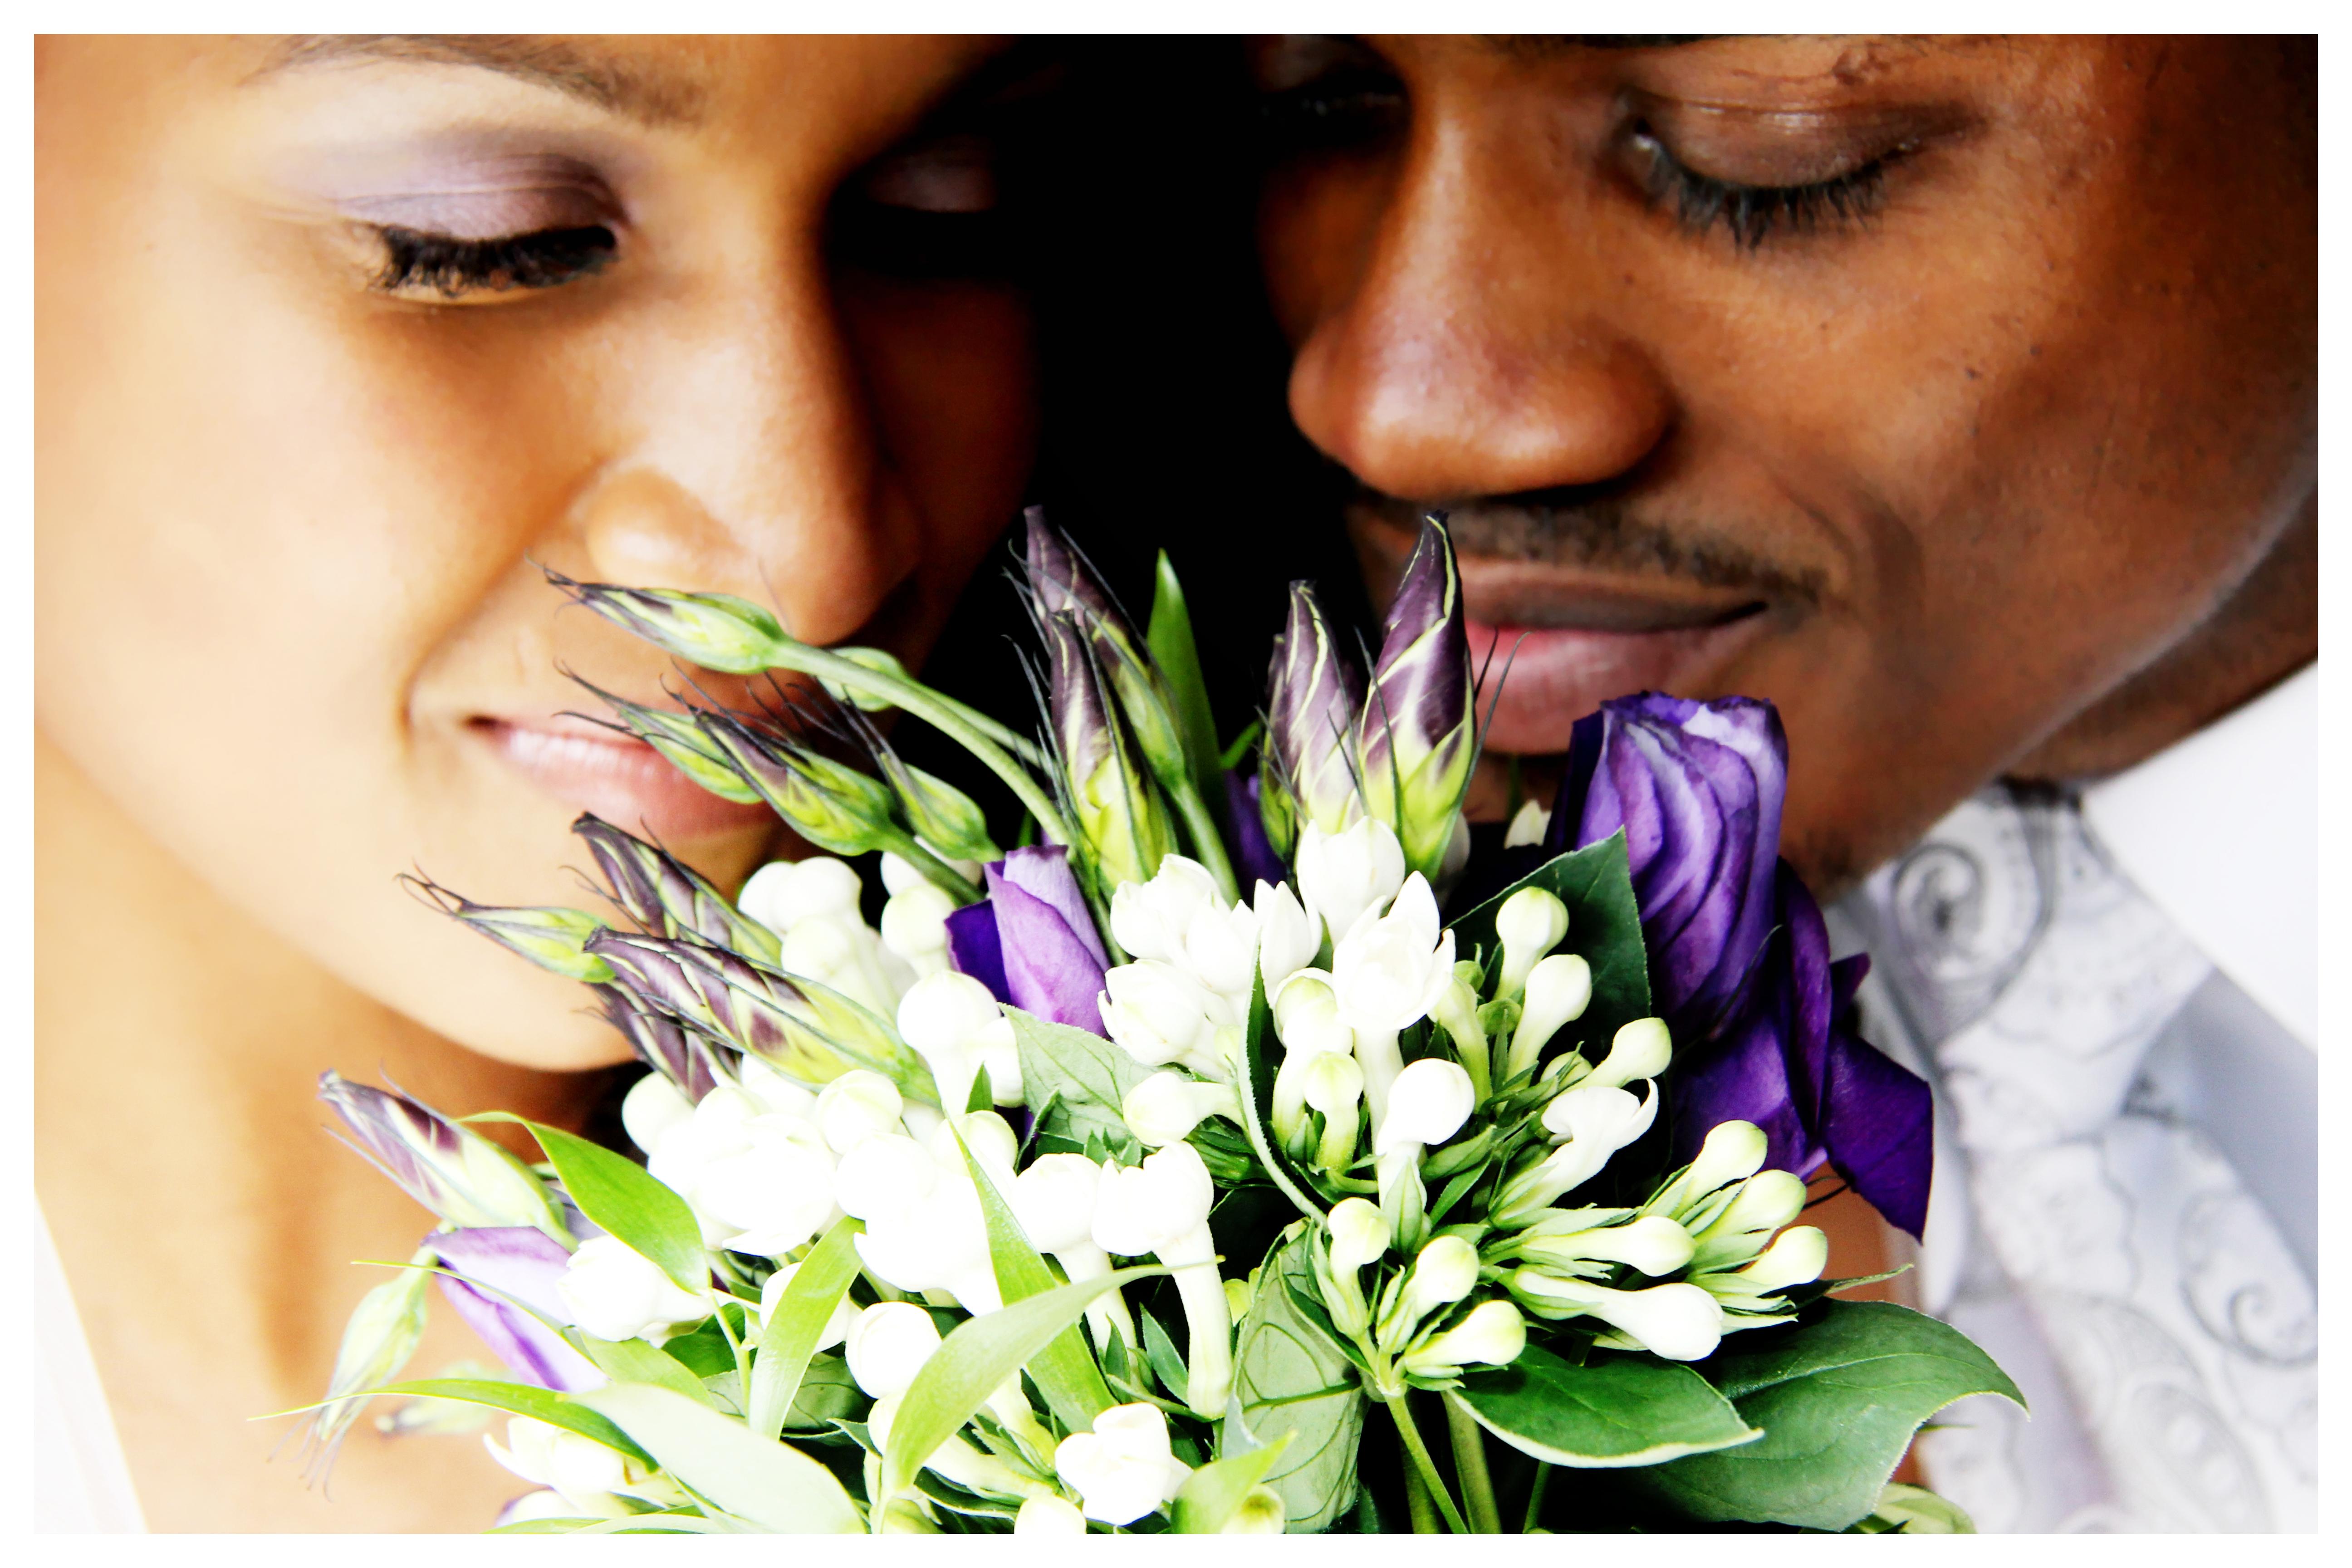 FLOWERS photos by Simeon Thaw copyright 2014 (20).jpg